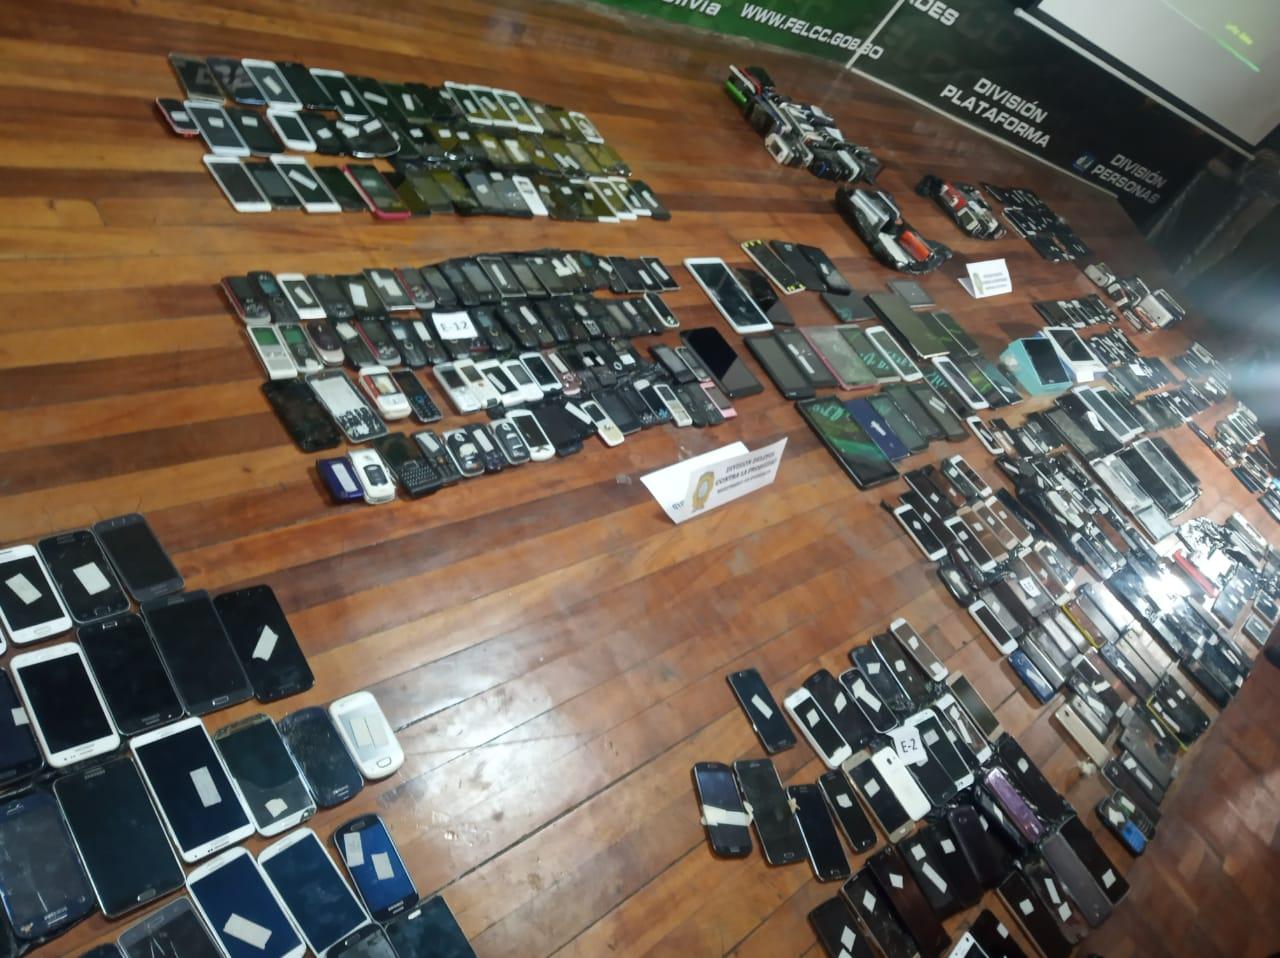 FELCC halla 700 celulares modificados en un centro técnico en la avenida Buenos Aires